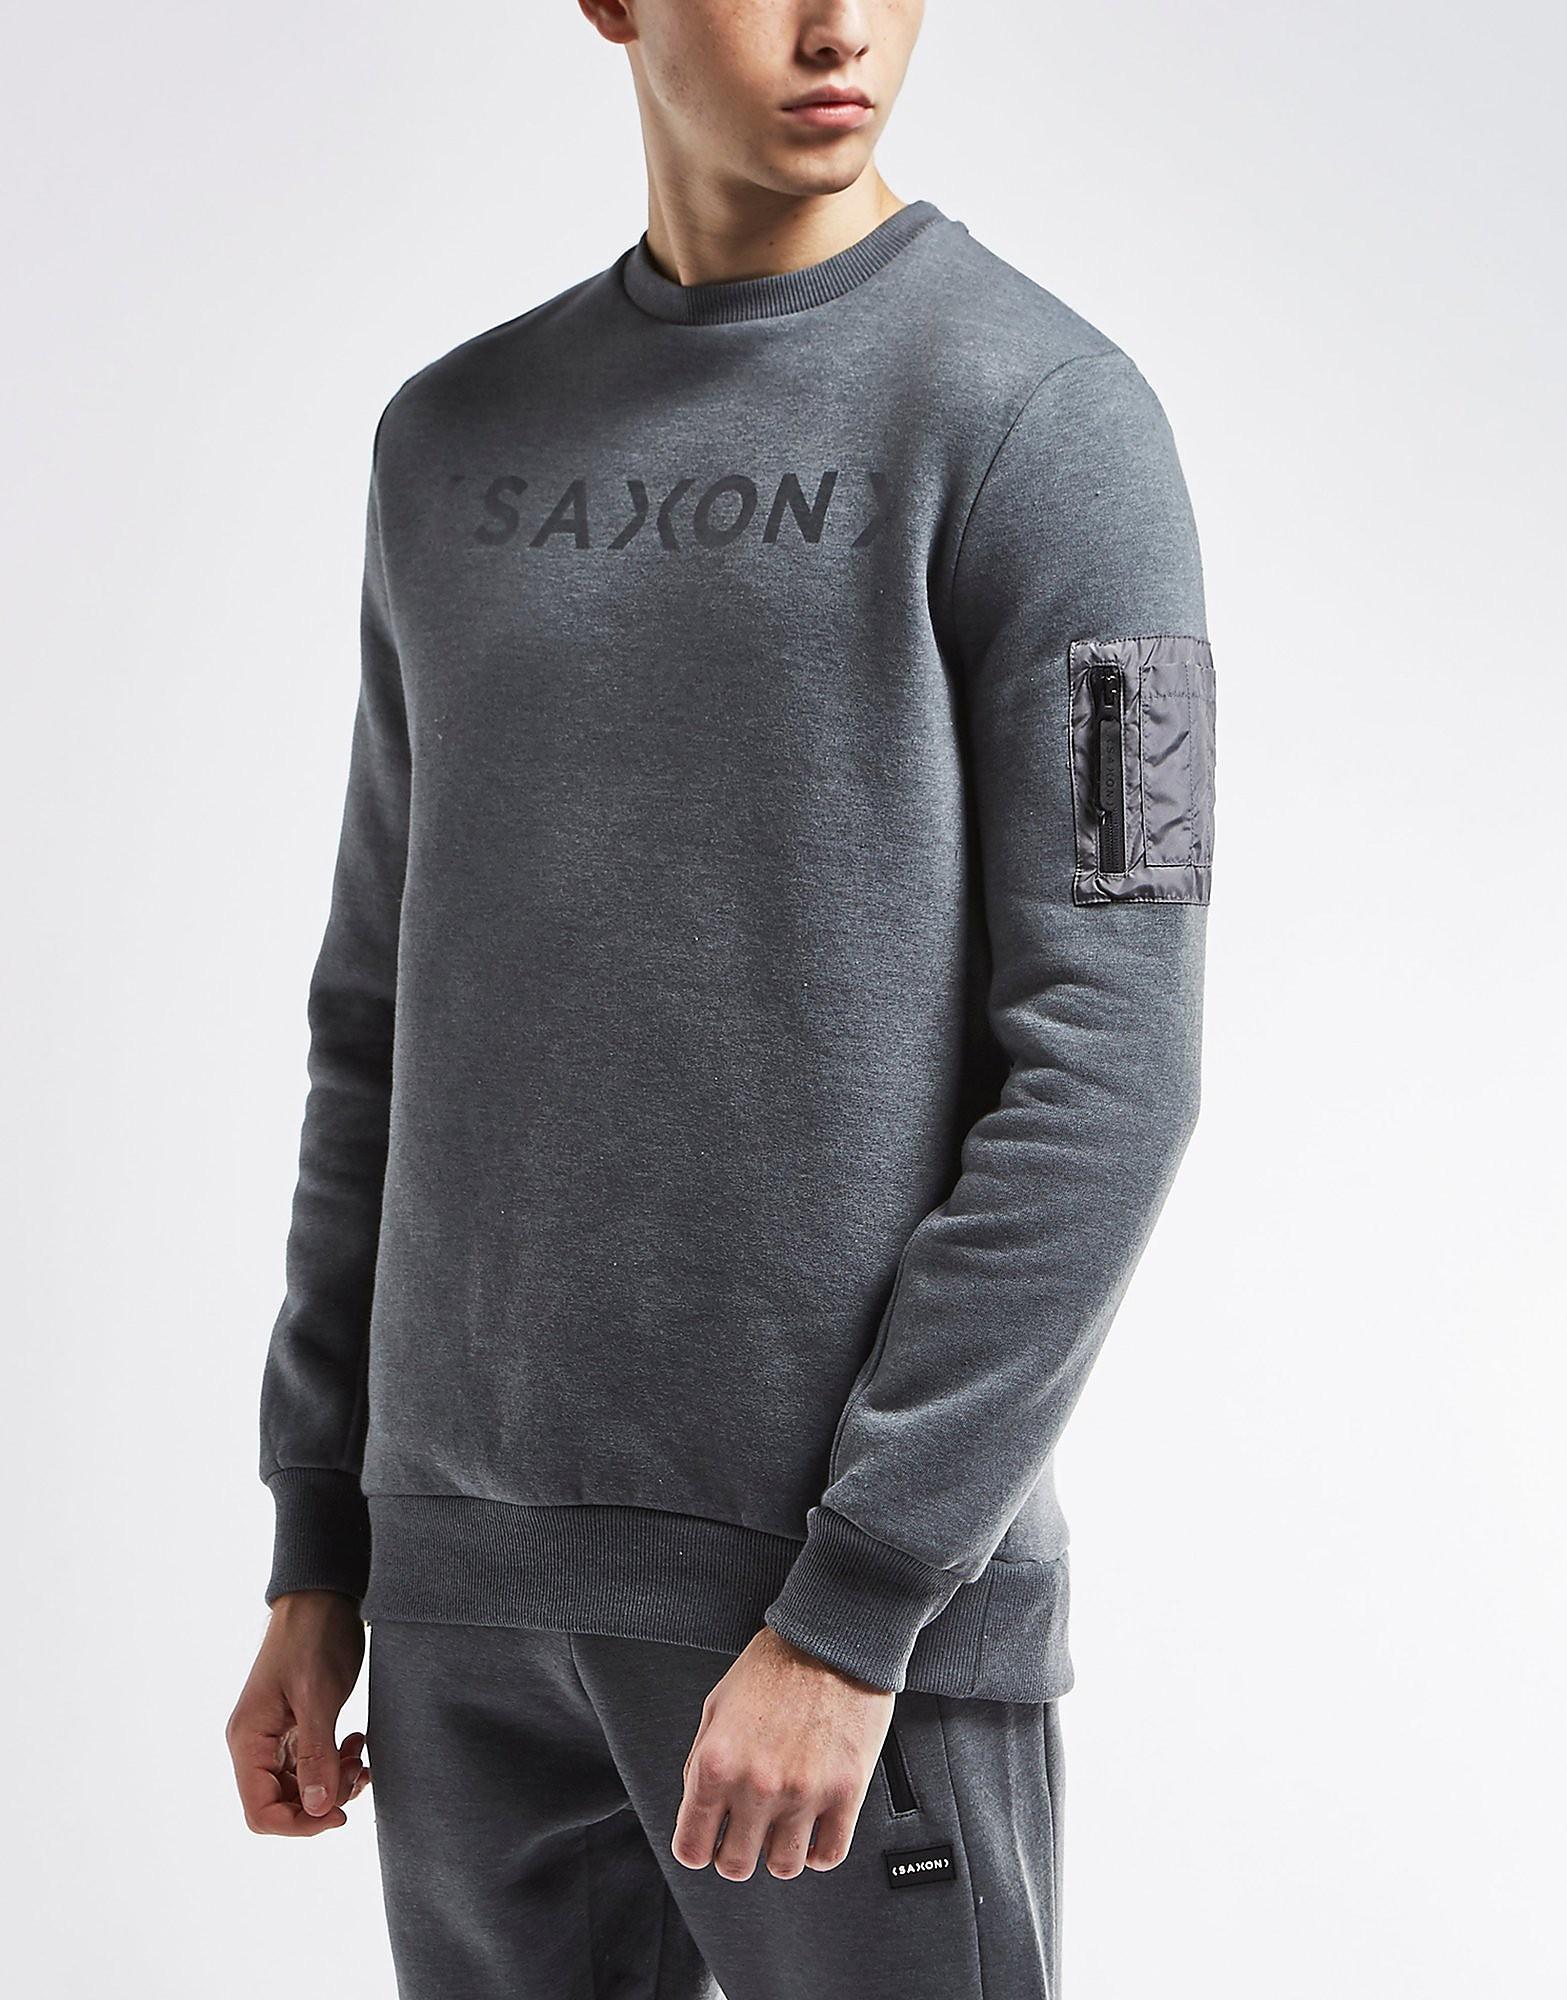 One True Saxon Renda Crew Neck Sweatshirt